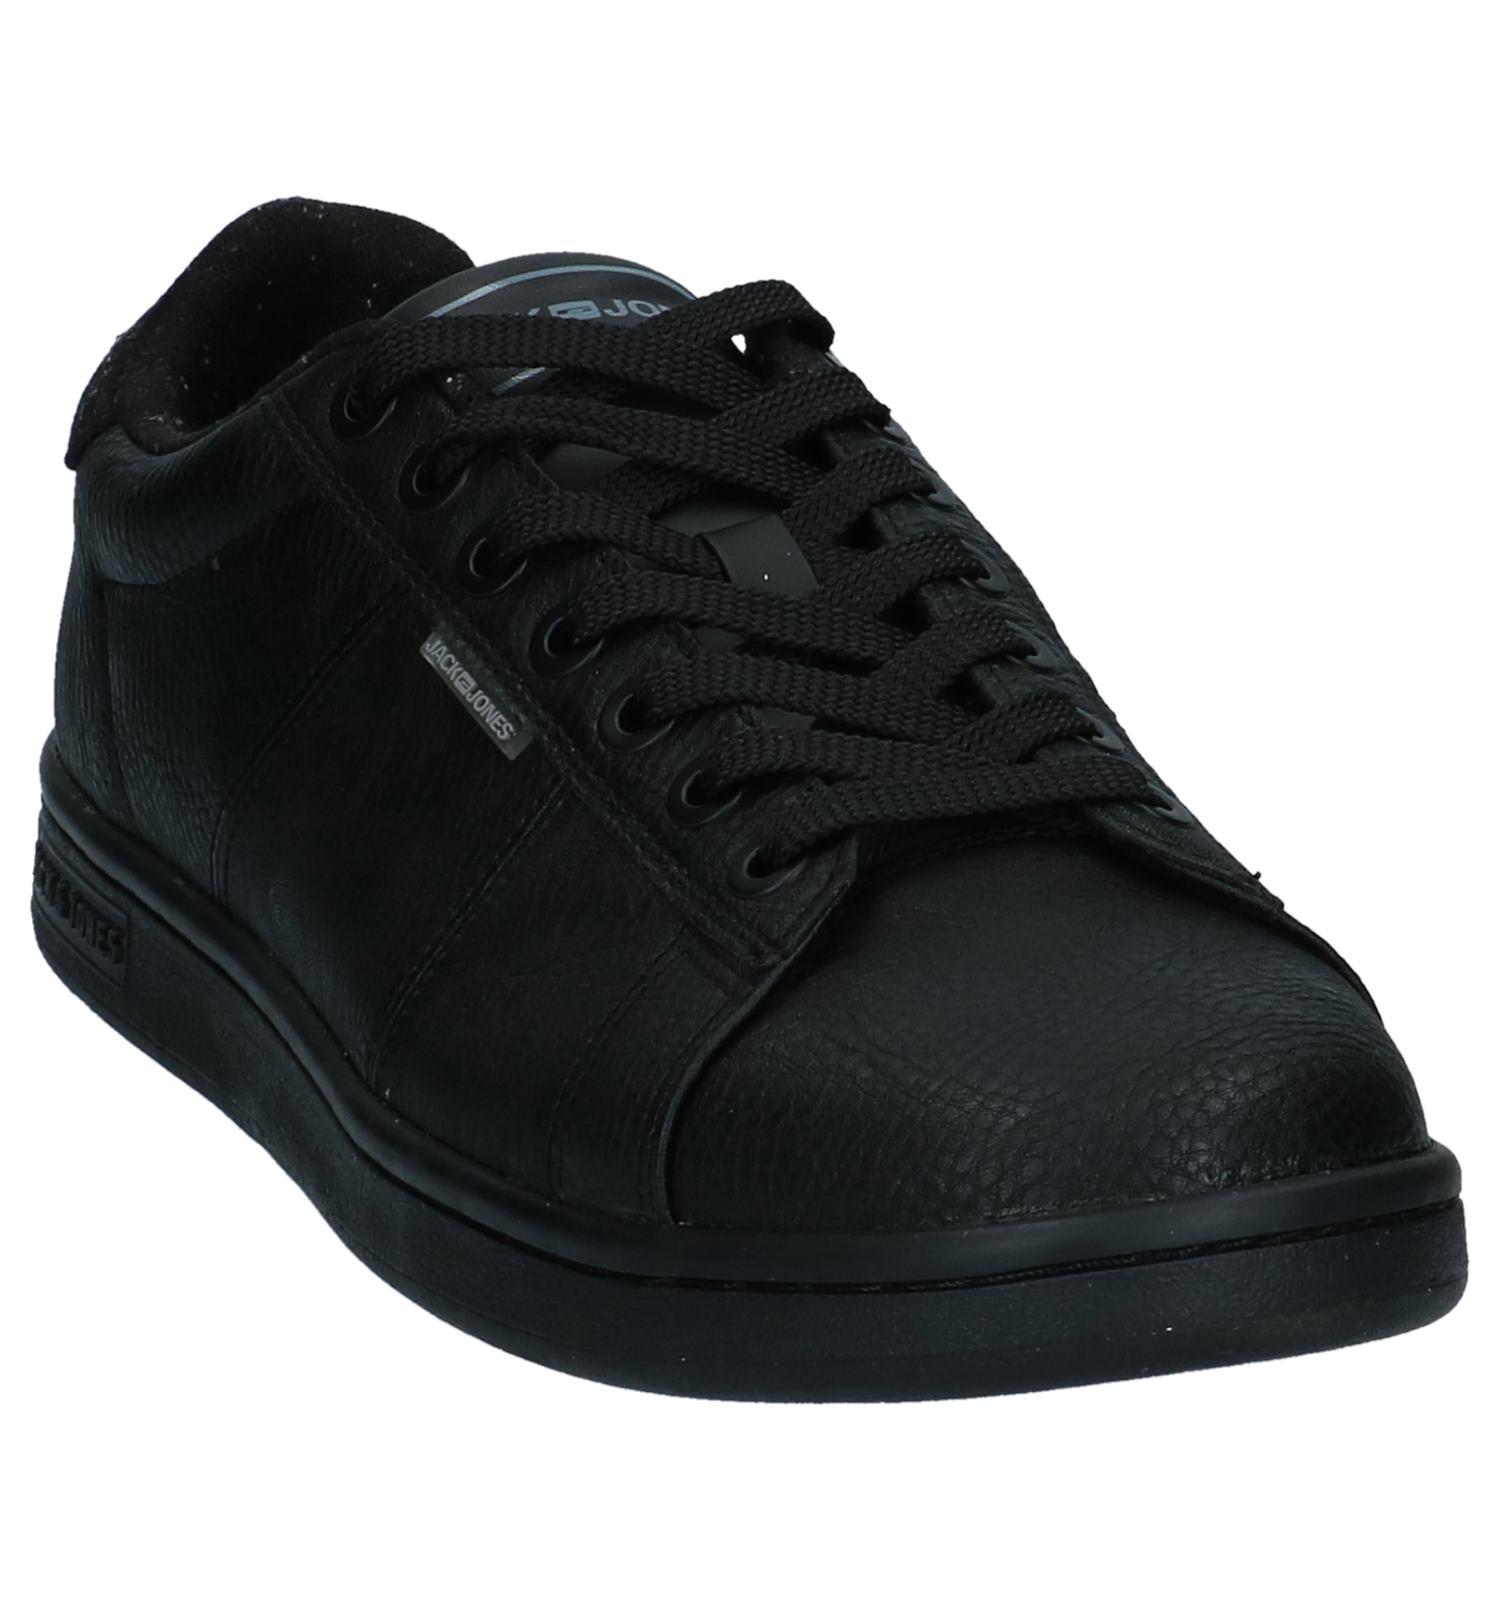 Jonges Sneakers Zwarte Pu Bane Jackamp; 2EHW9ID